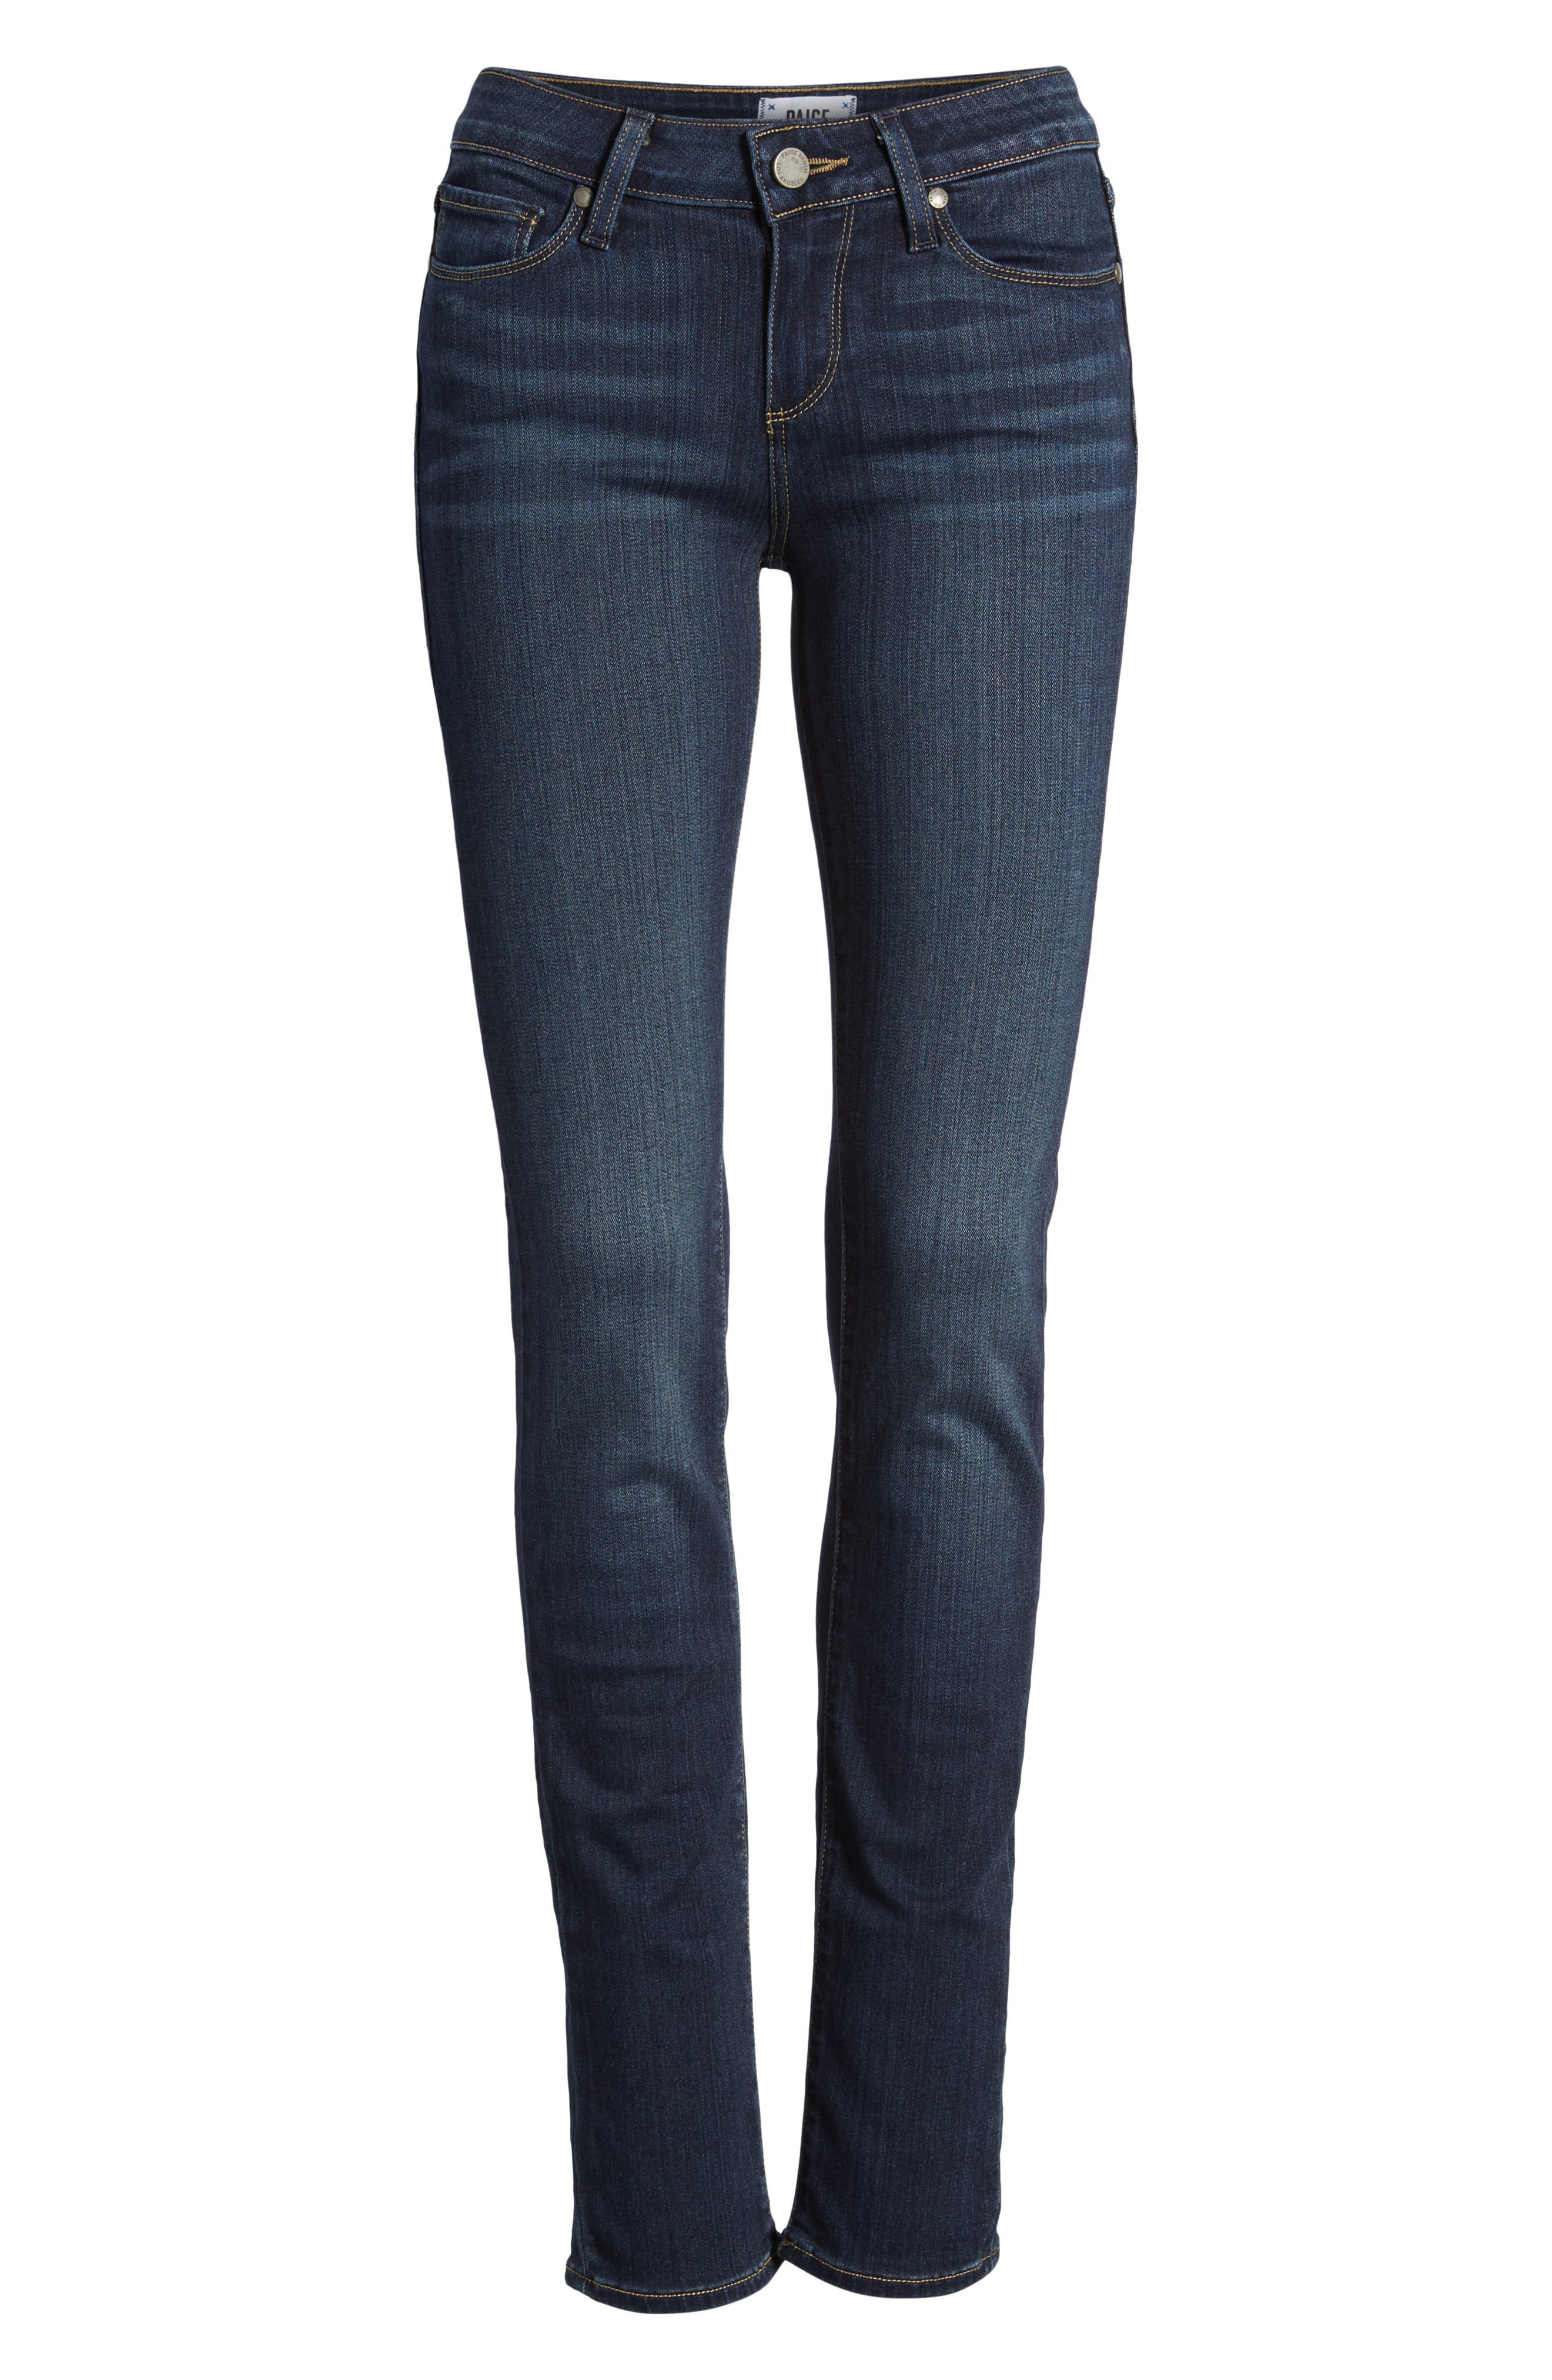 Denim 'Skyline' Skinny Jeans,                             Alternate thumbnail 2, color,                             400